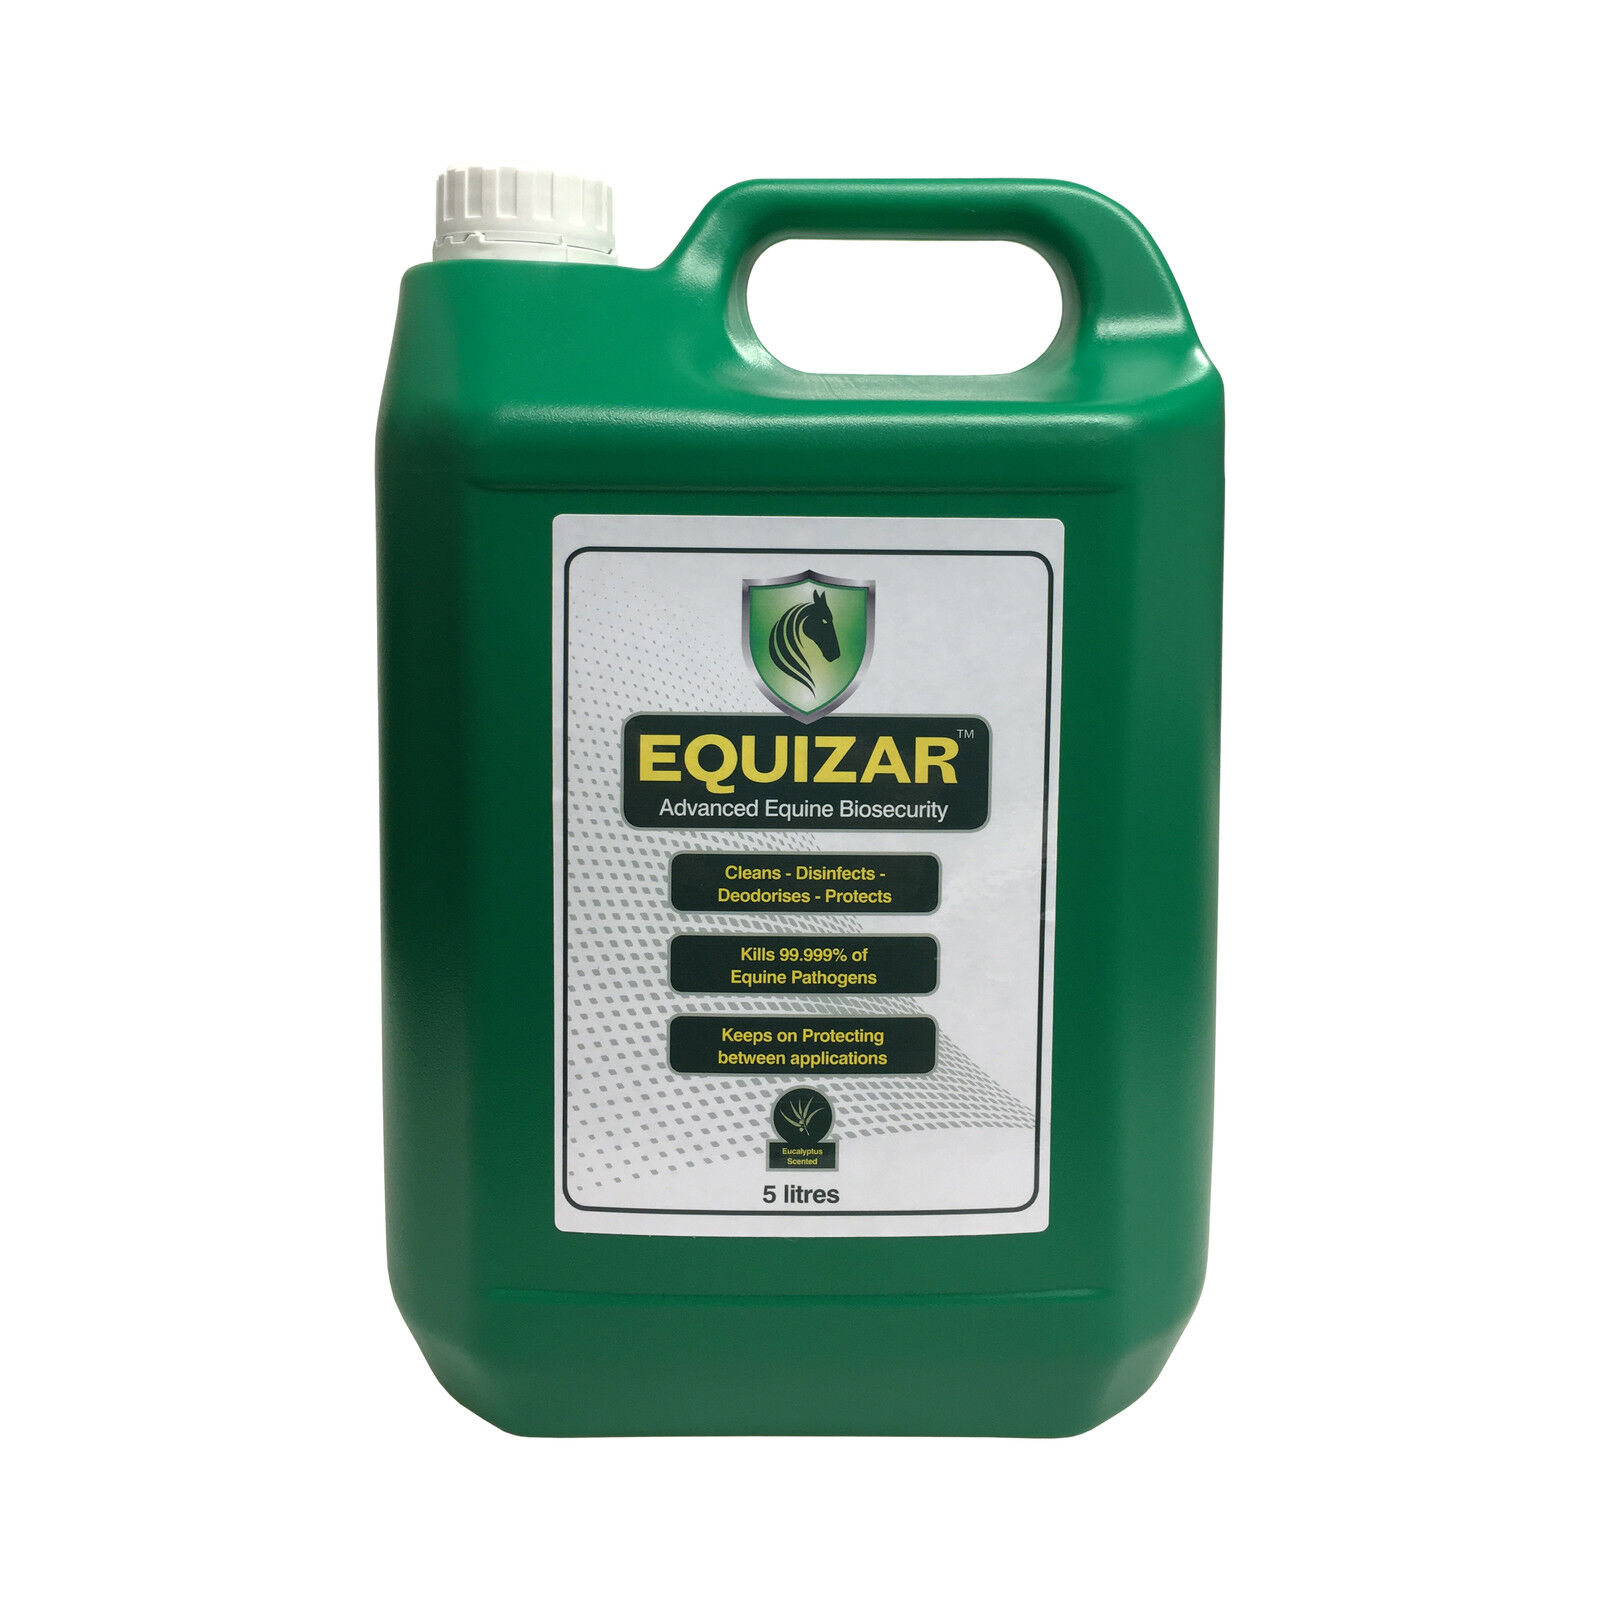 Equizar Advanced Equine Biosecurity 5L 5L Biosecurity 6e8ccb